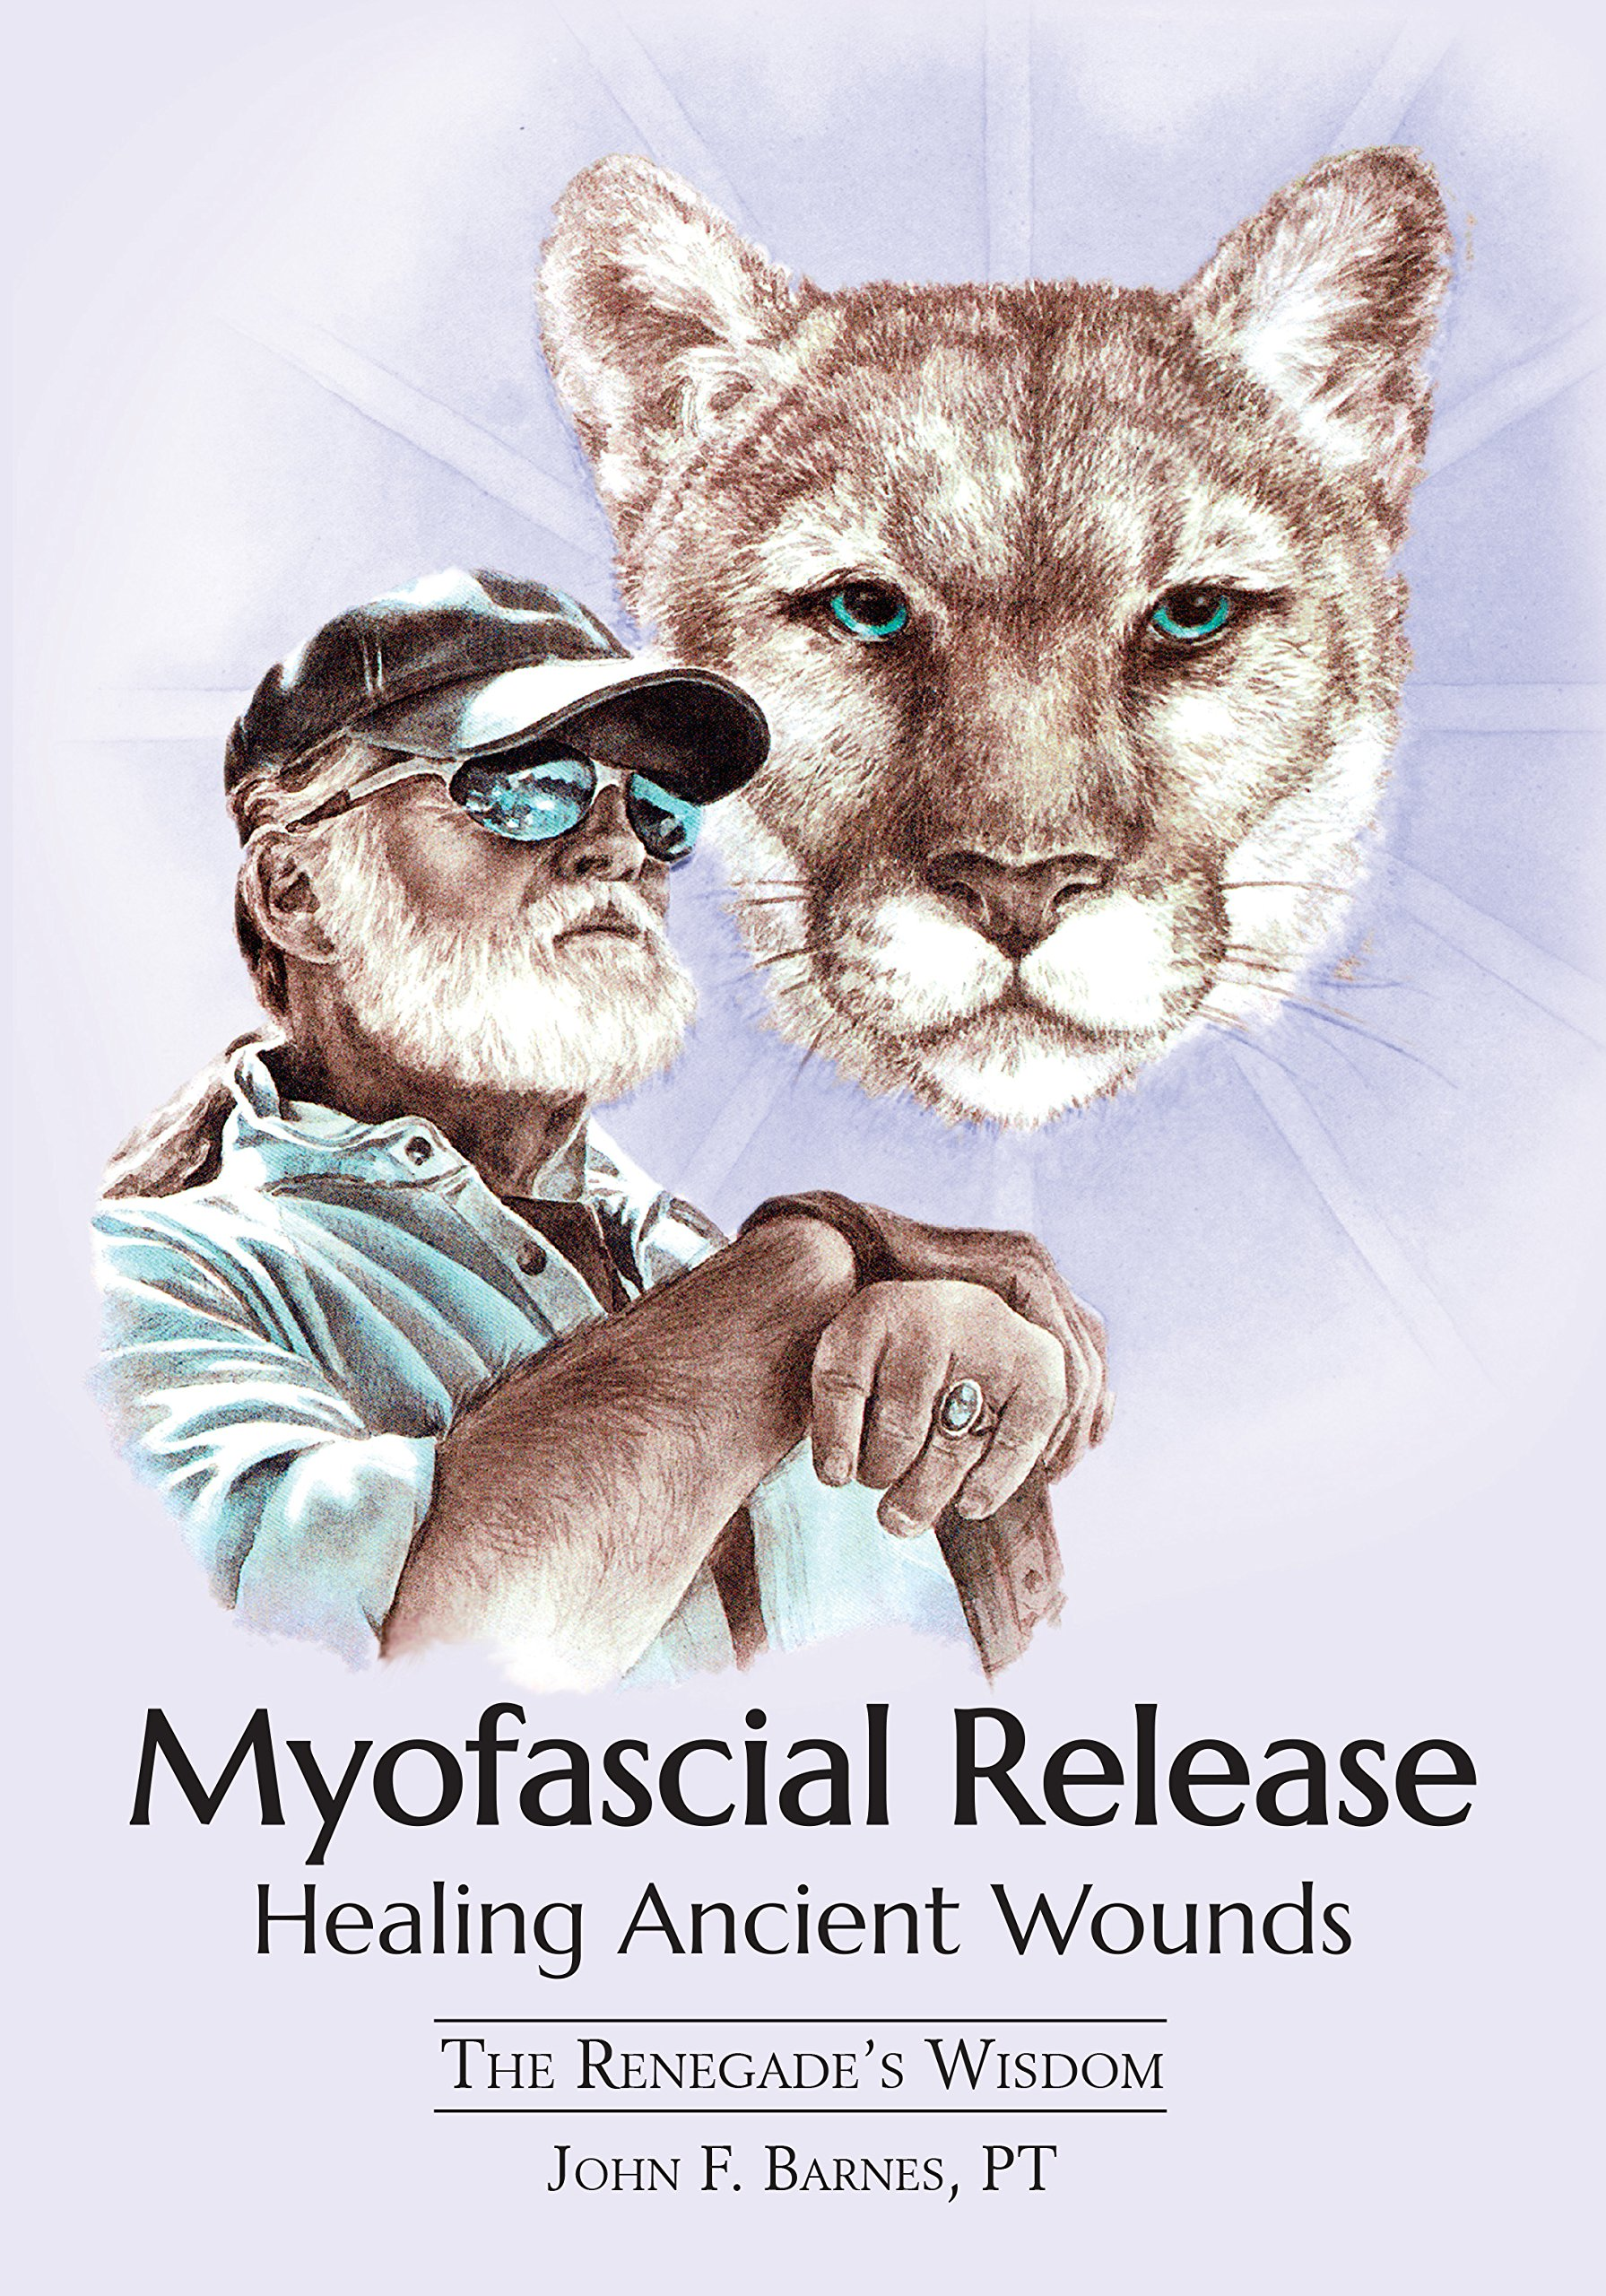 Myofascial Release Healing Ancient Wounds The Renegades Wisdom